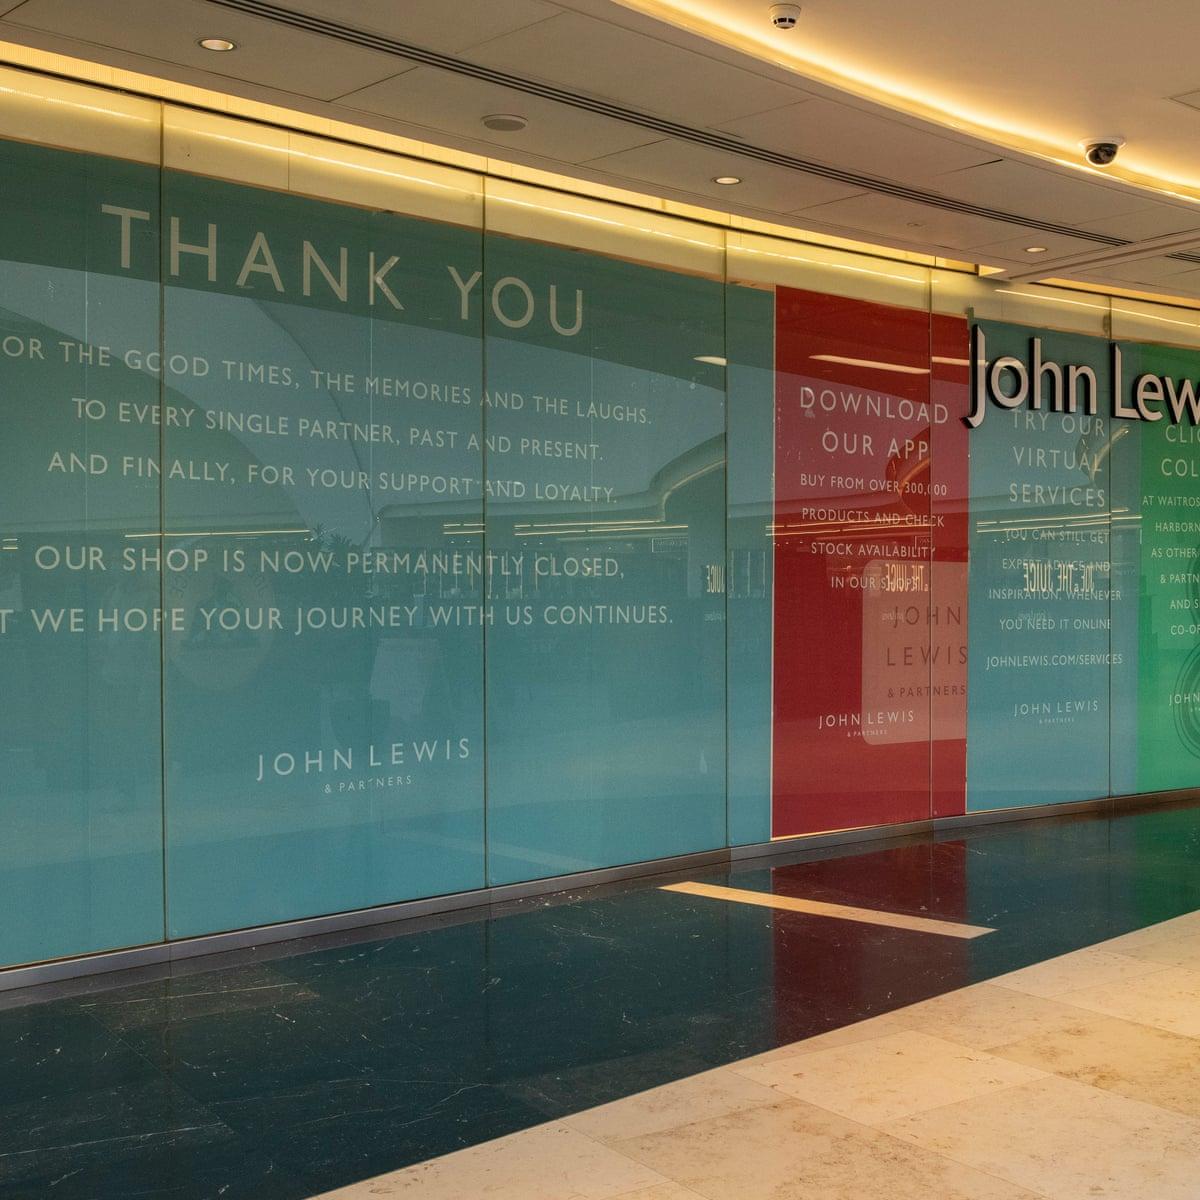 John Lewis Store Closure